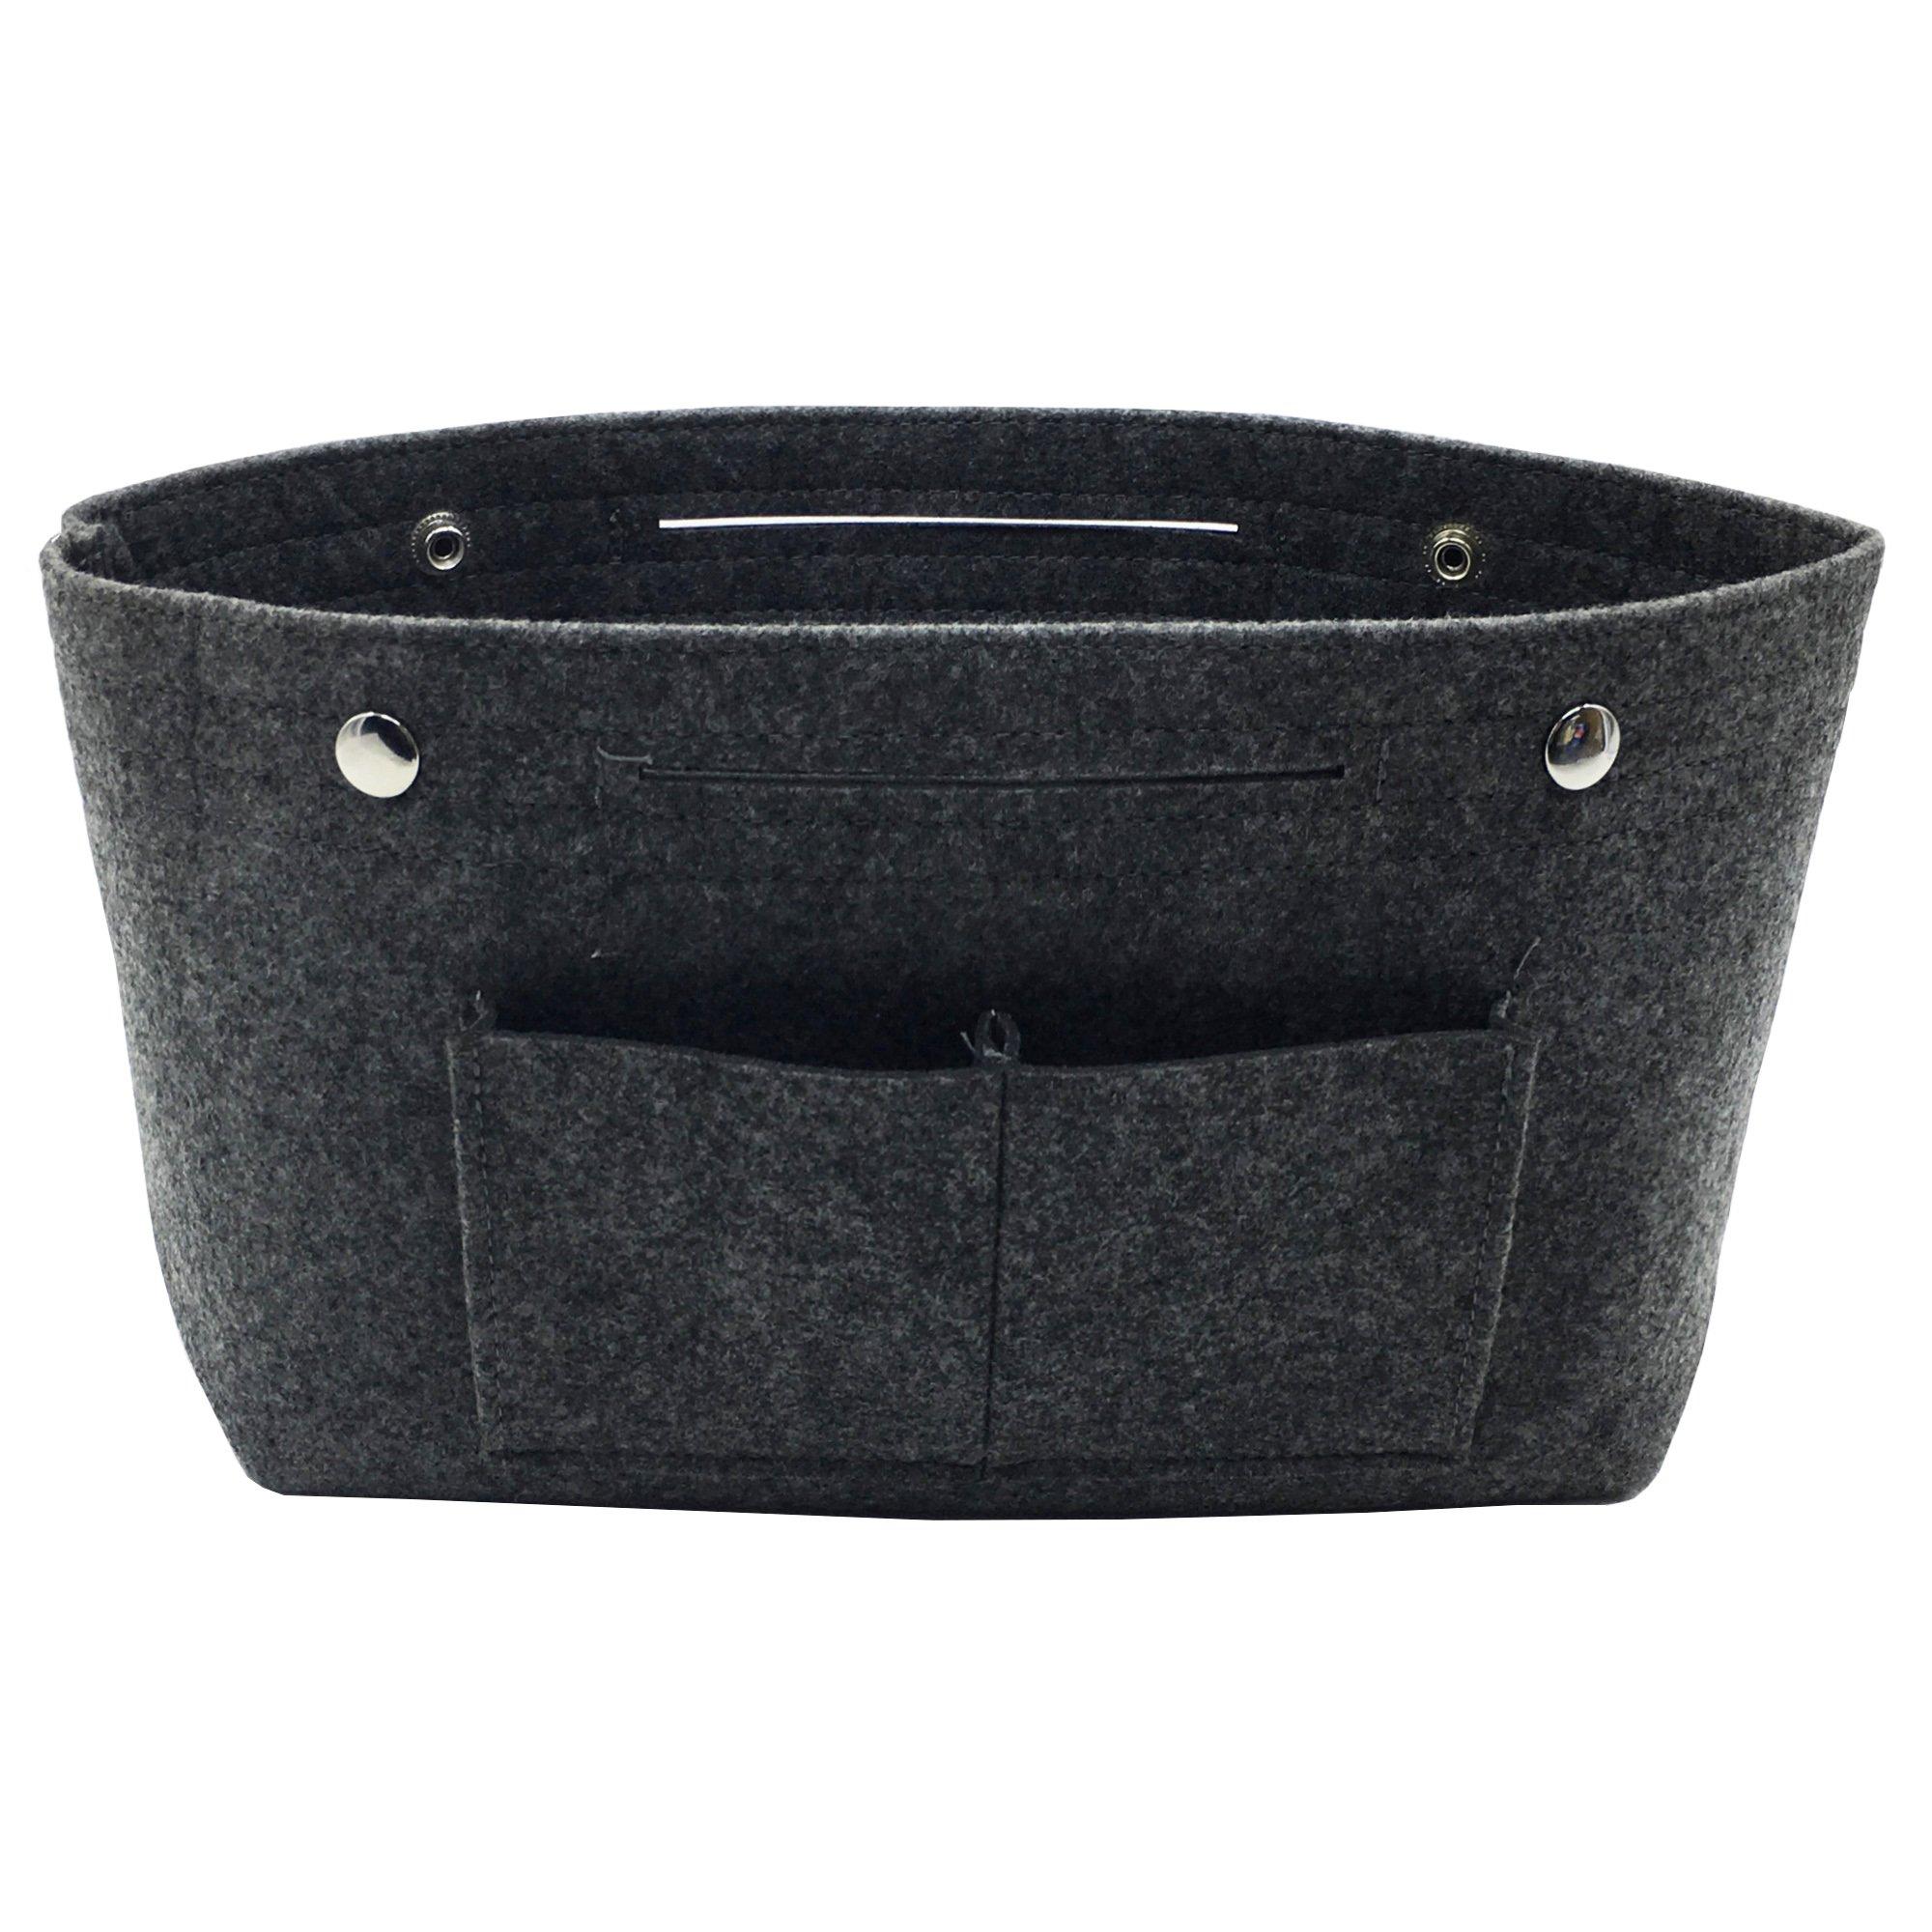 VANCORE Felt Insert Purse Organizer Handbag Cosmetic Travel Bag for Women Dark grey Small